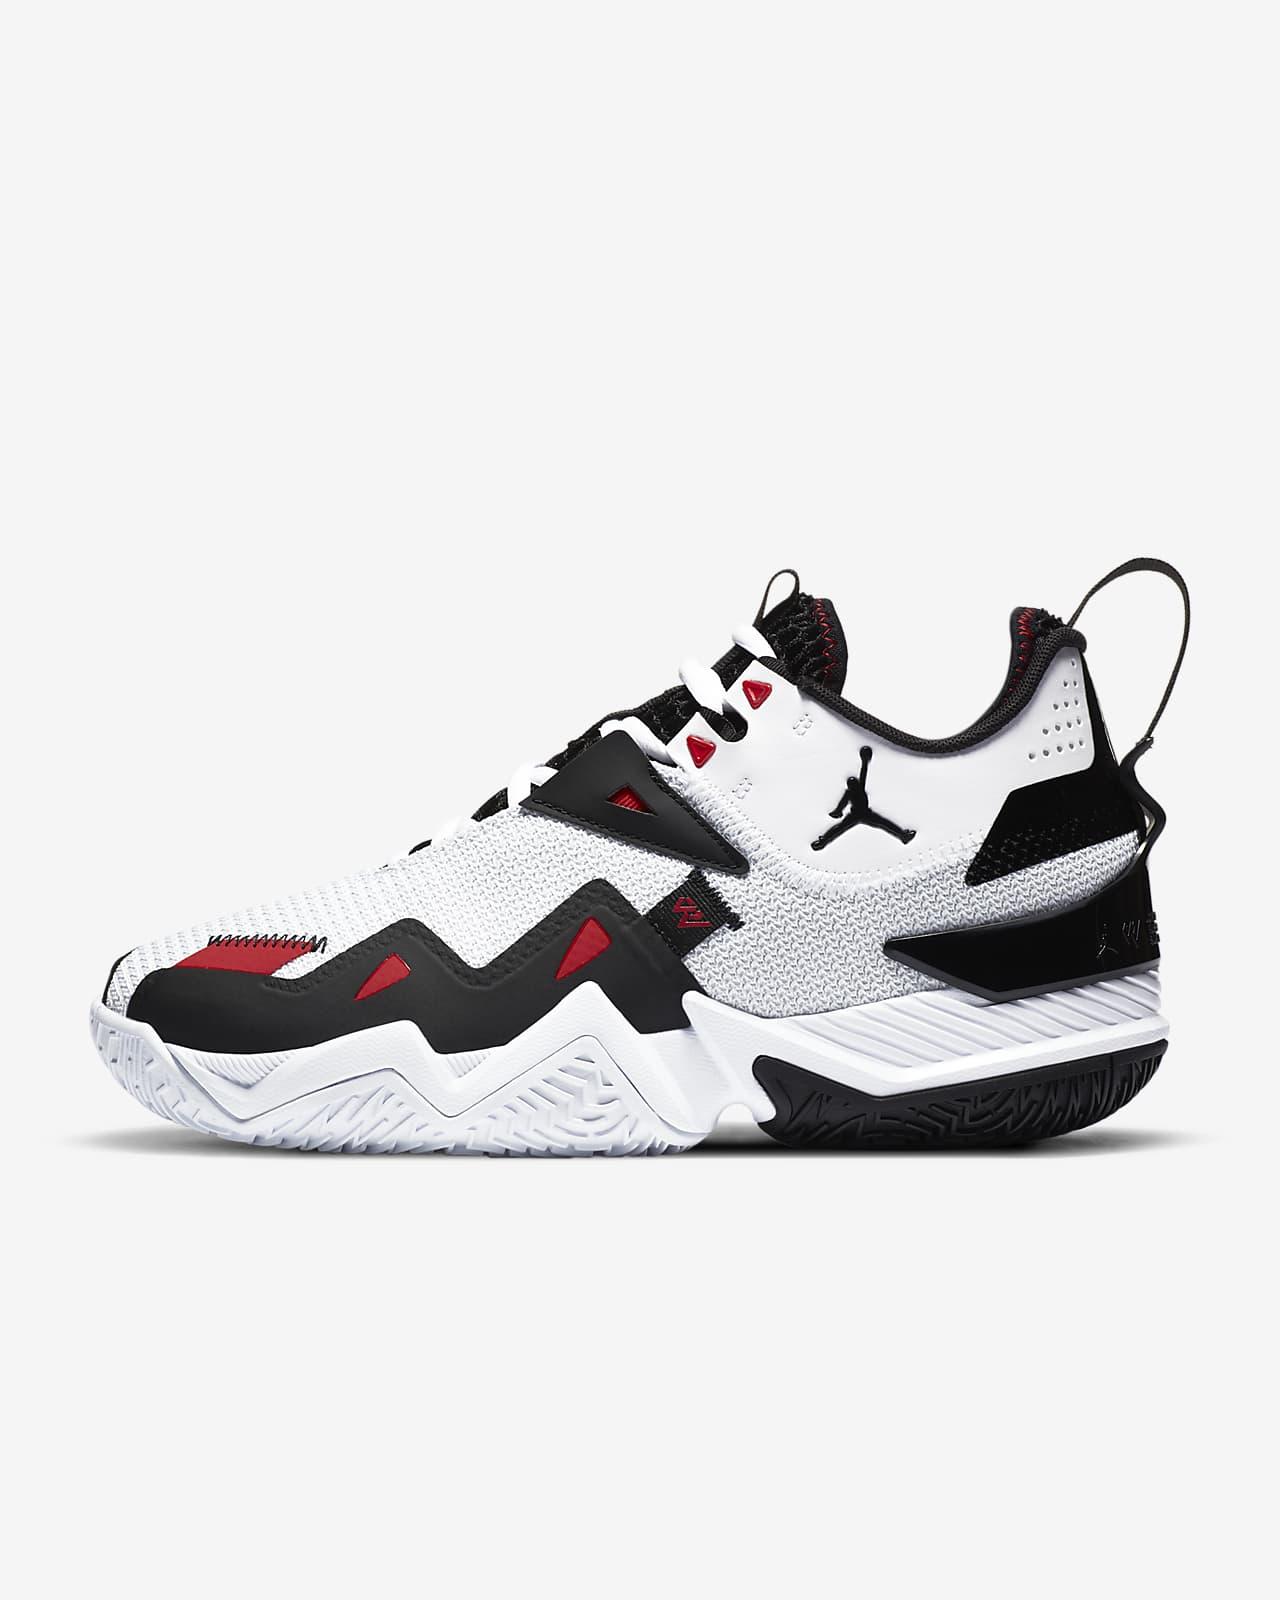 Jordan Westbrook One Take PF 籃球鞋